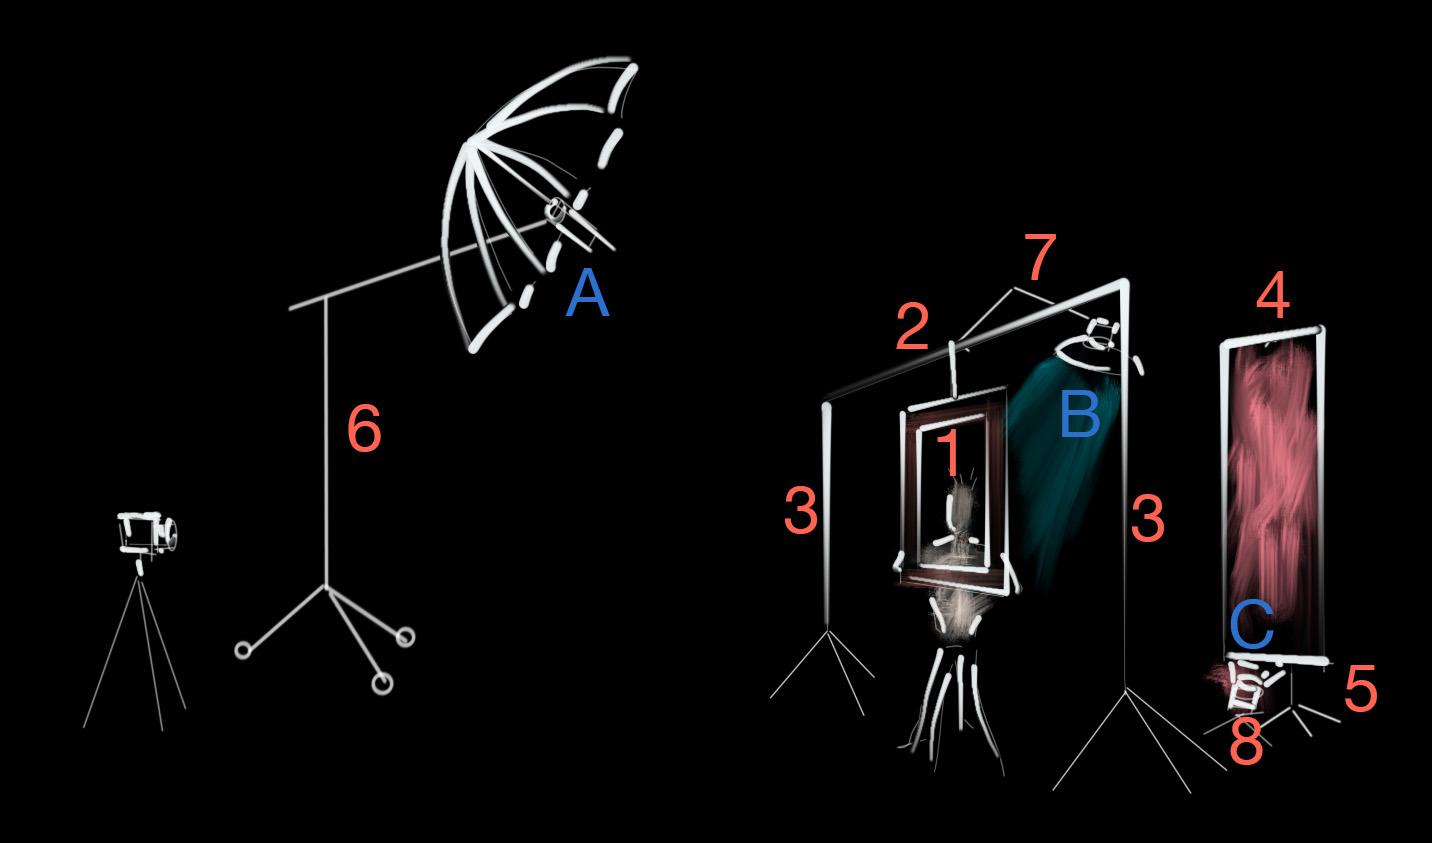 - lighting diagram